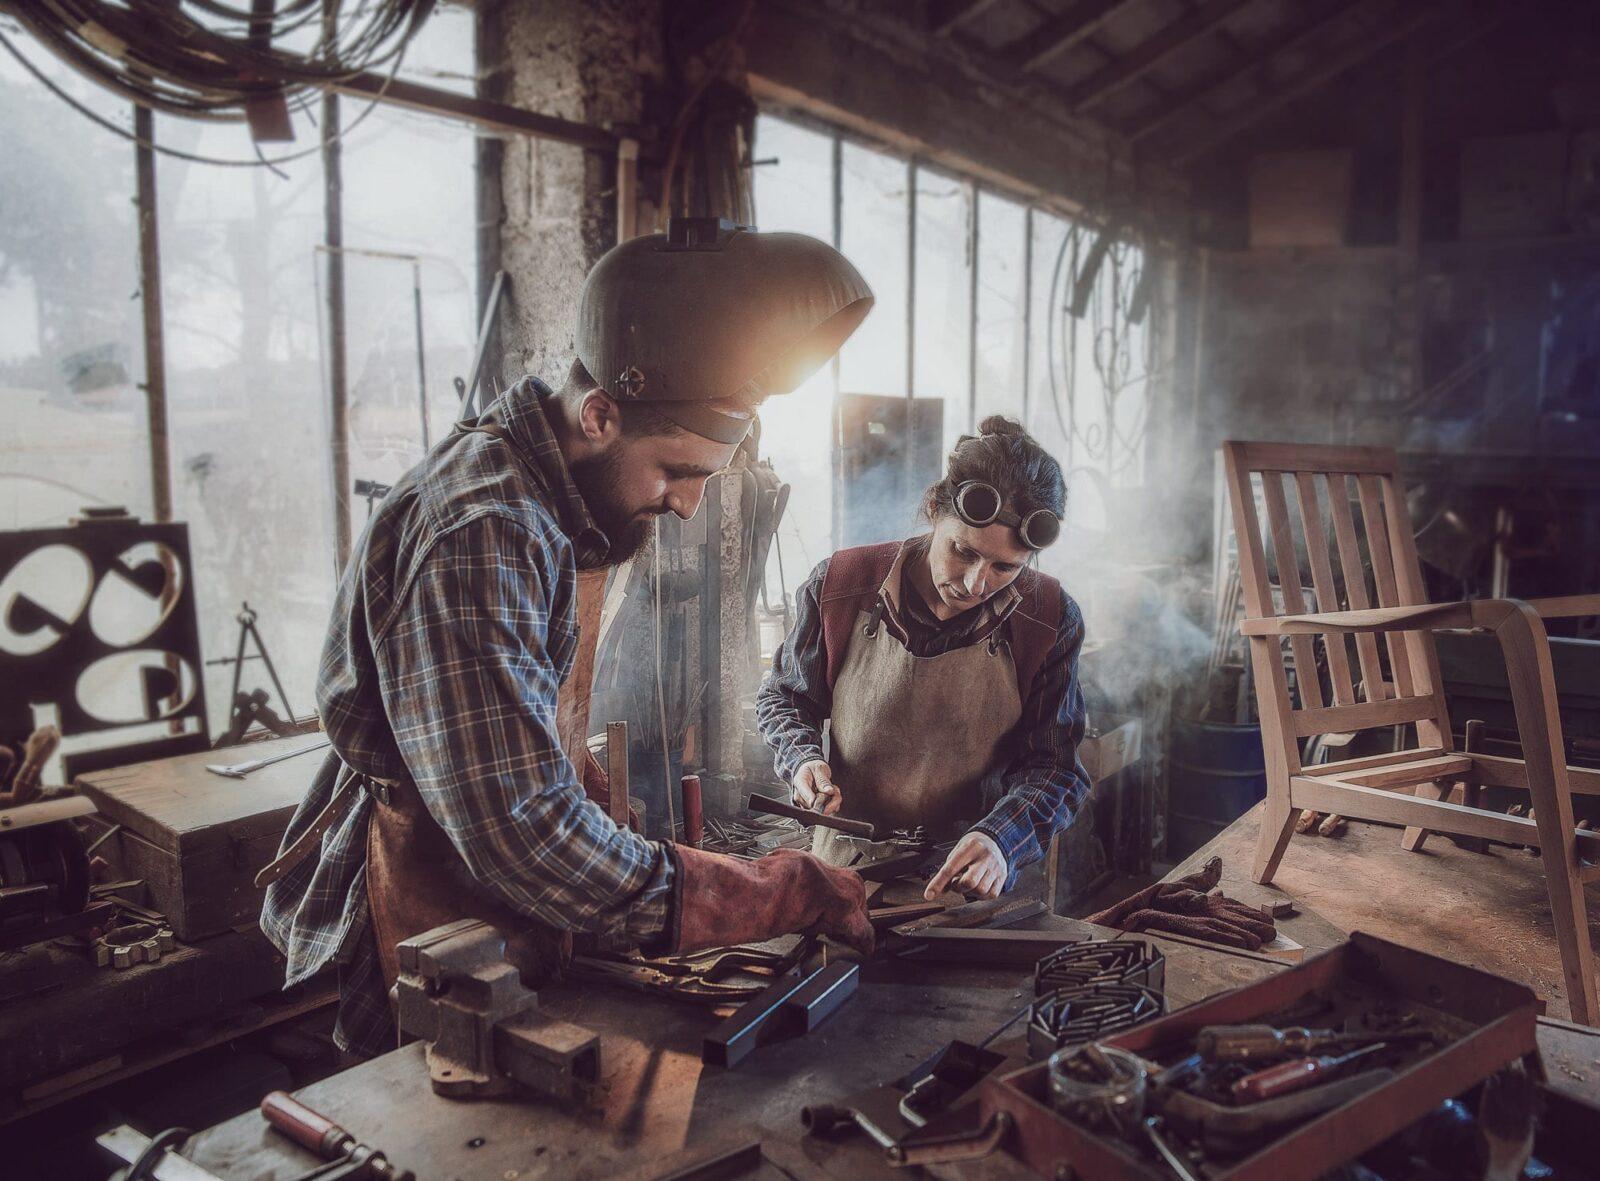 Two people in workshop